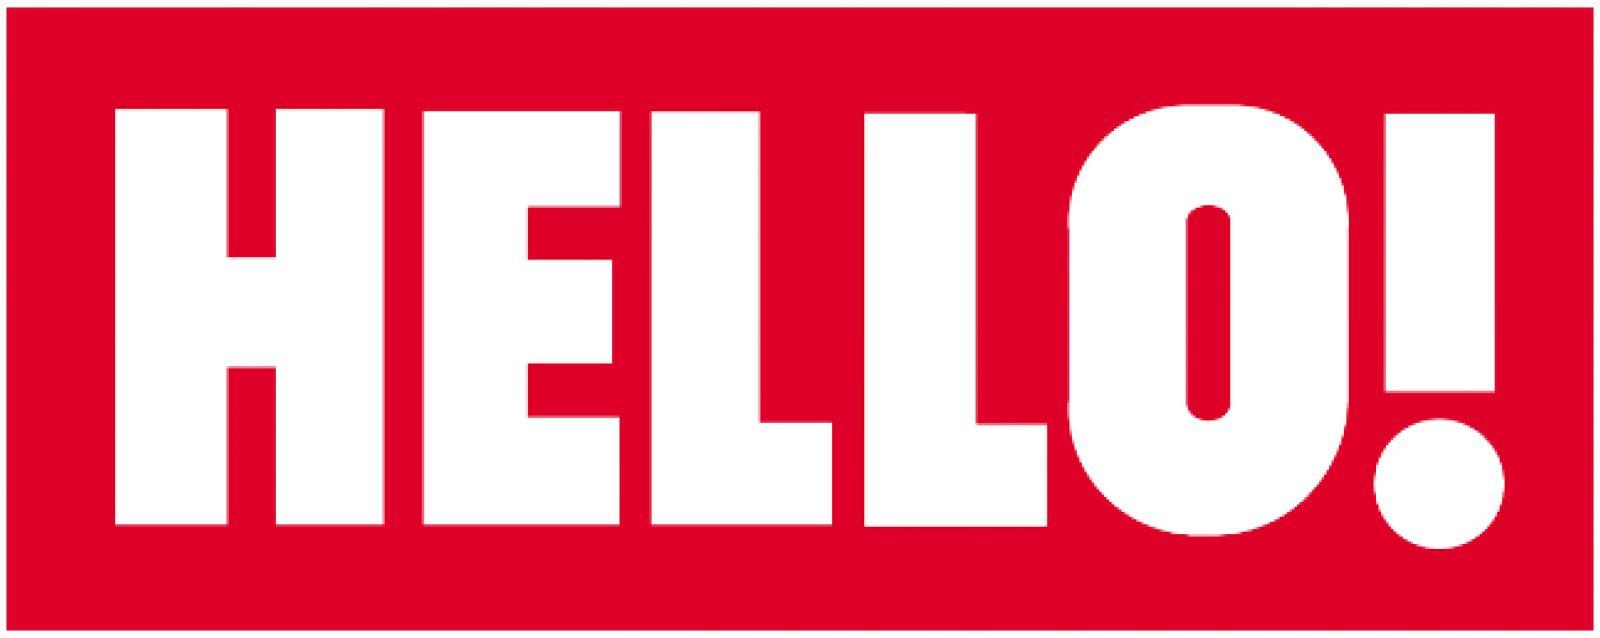 hello-logo.jpg